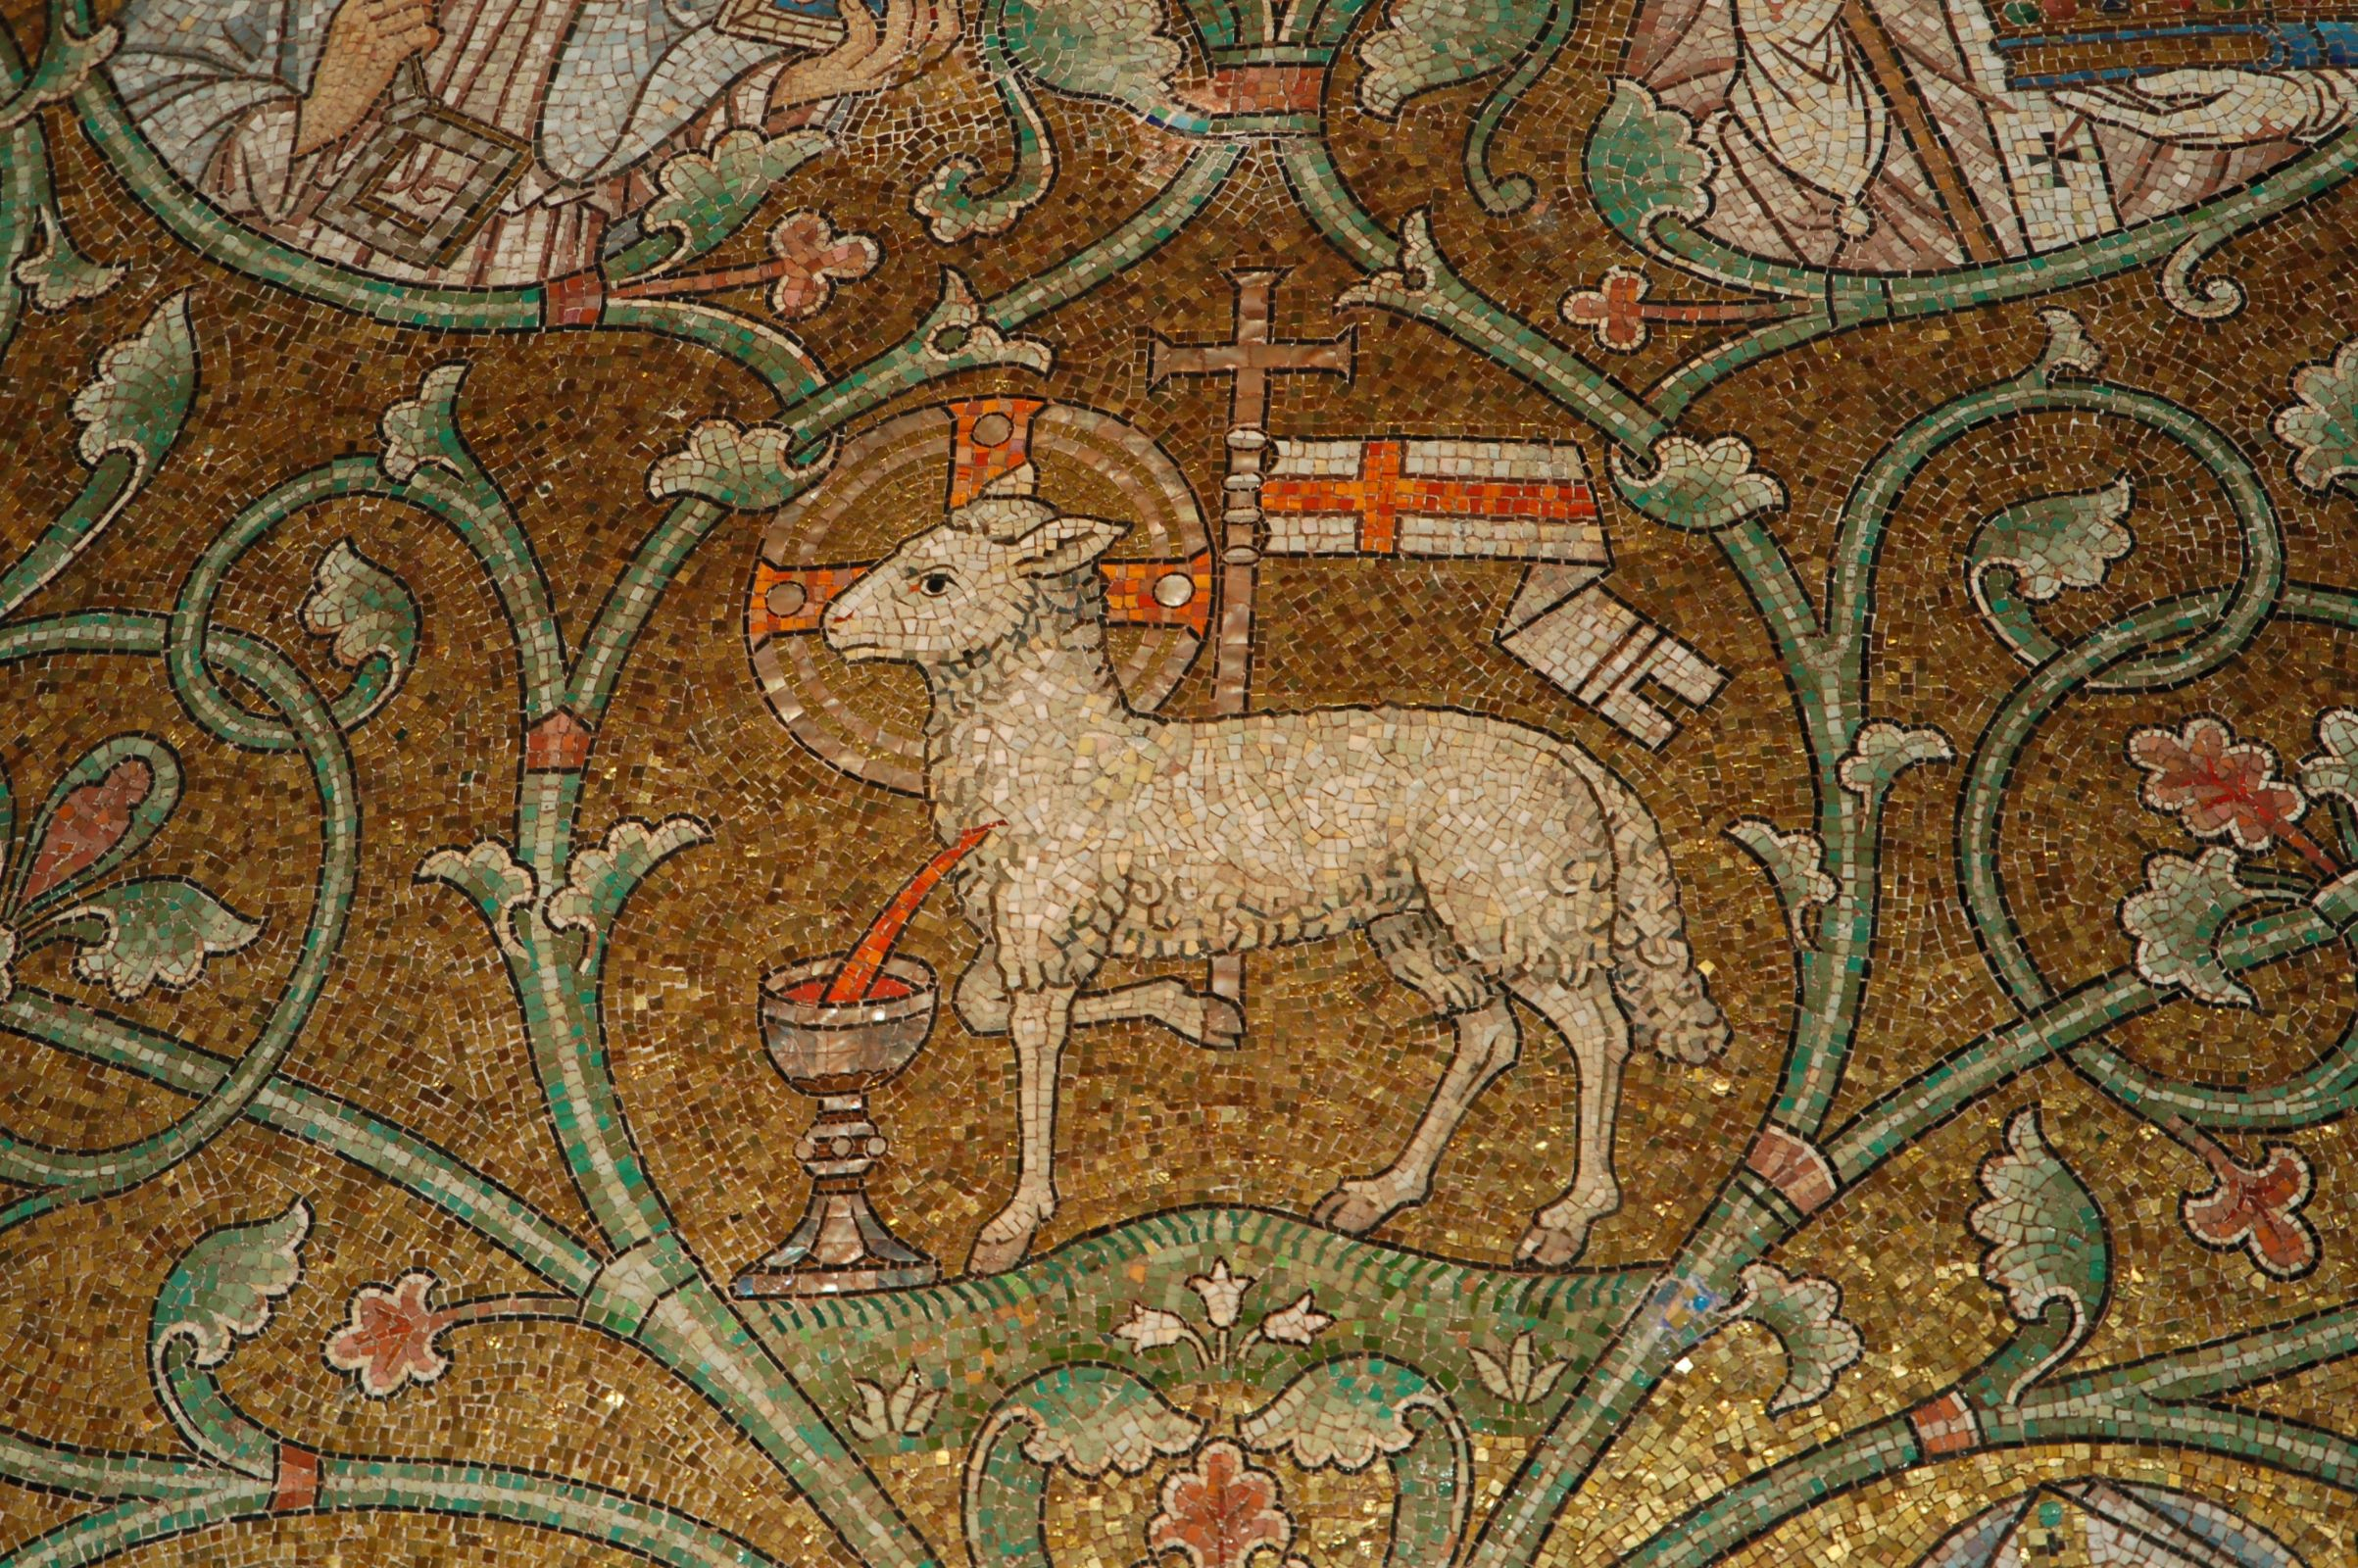 Image 16 The Sacrificial Lamb